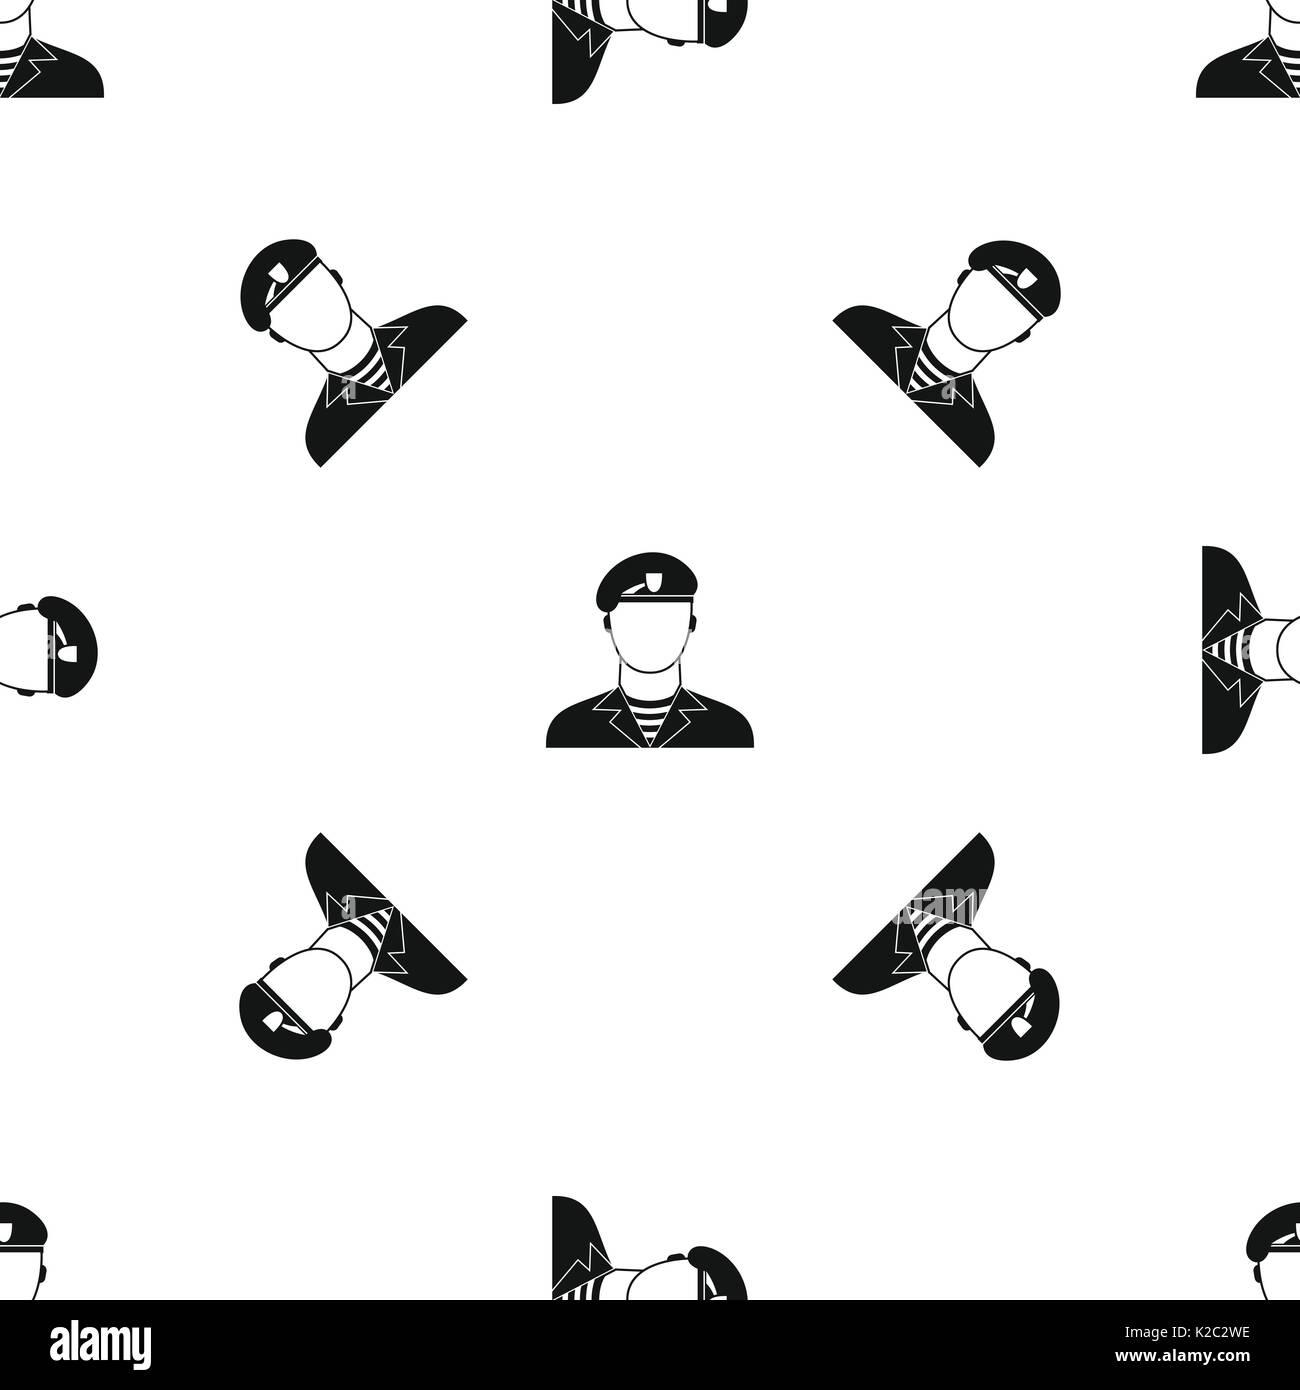 Modern army soldier pattern seamless black - Stock Image